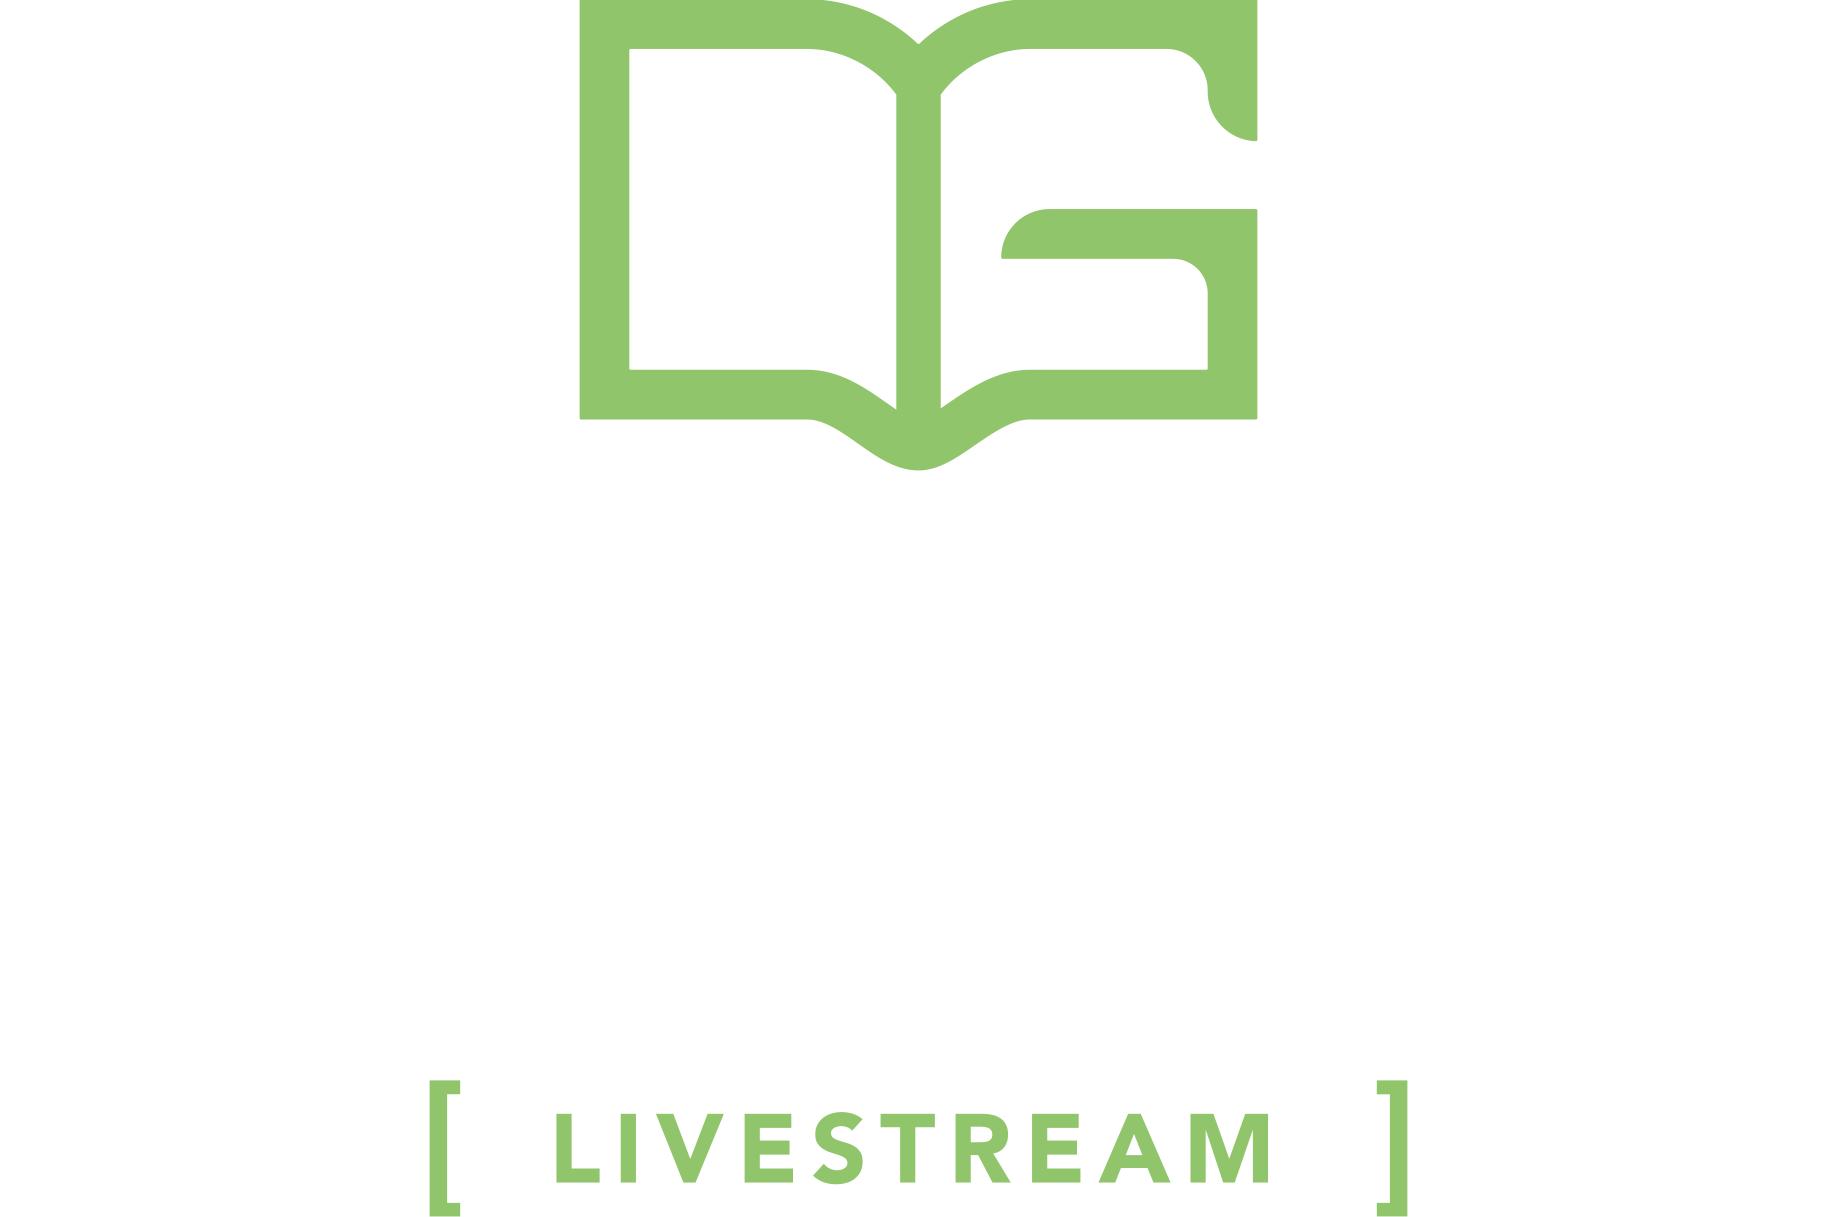 DOVE Global Livestream Logo